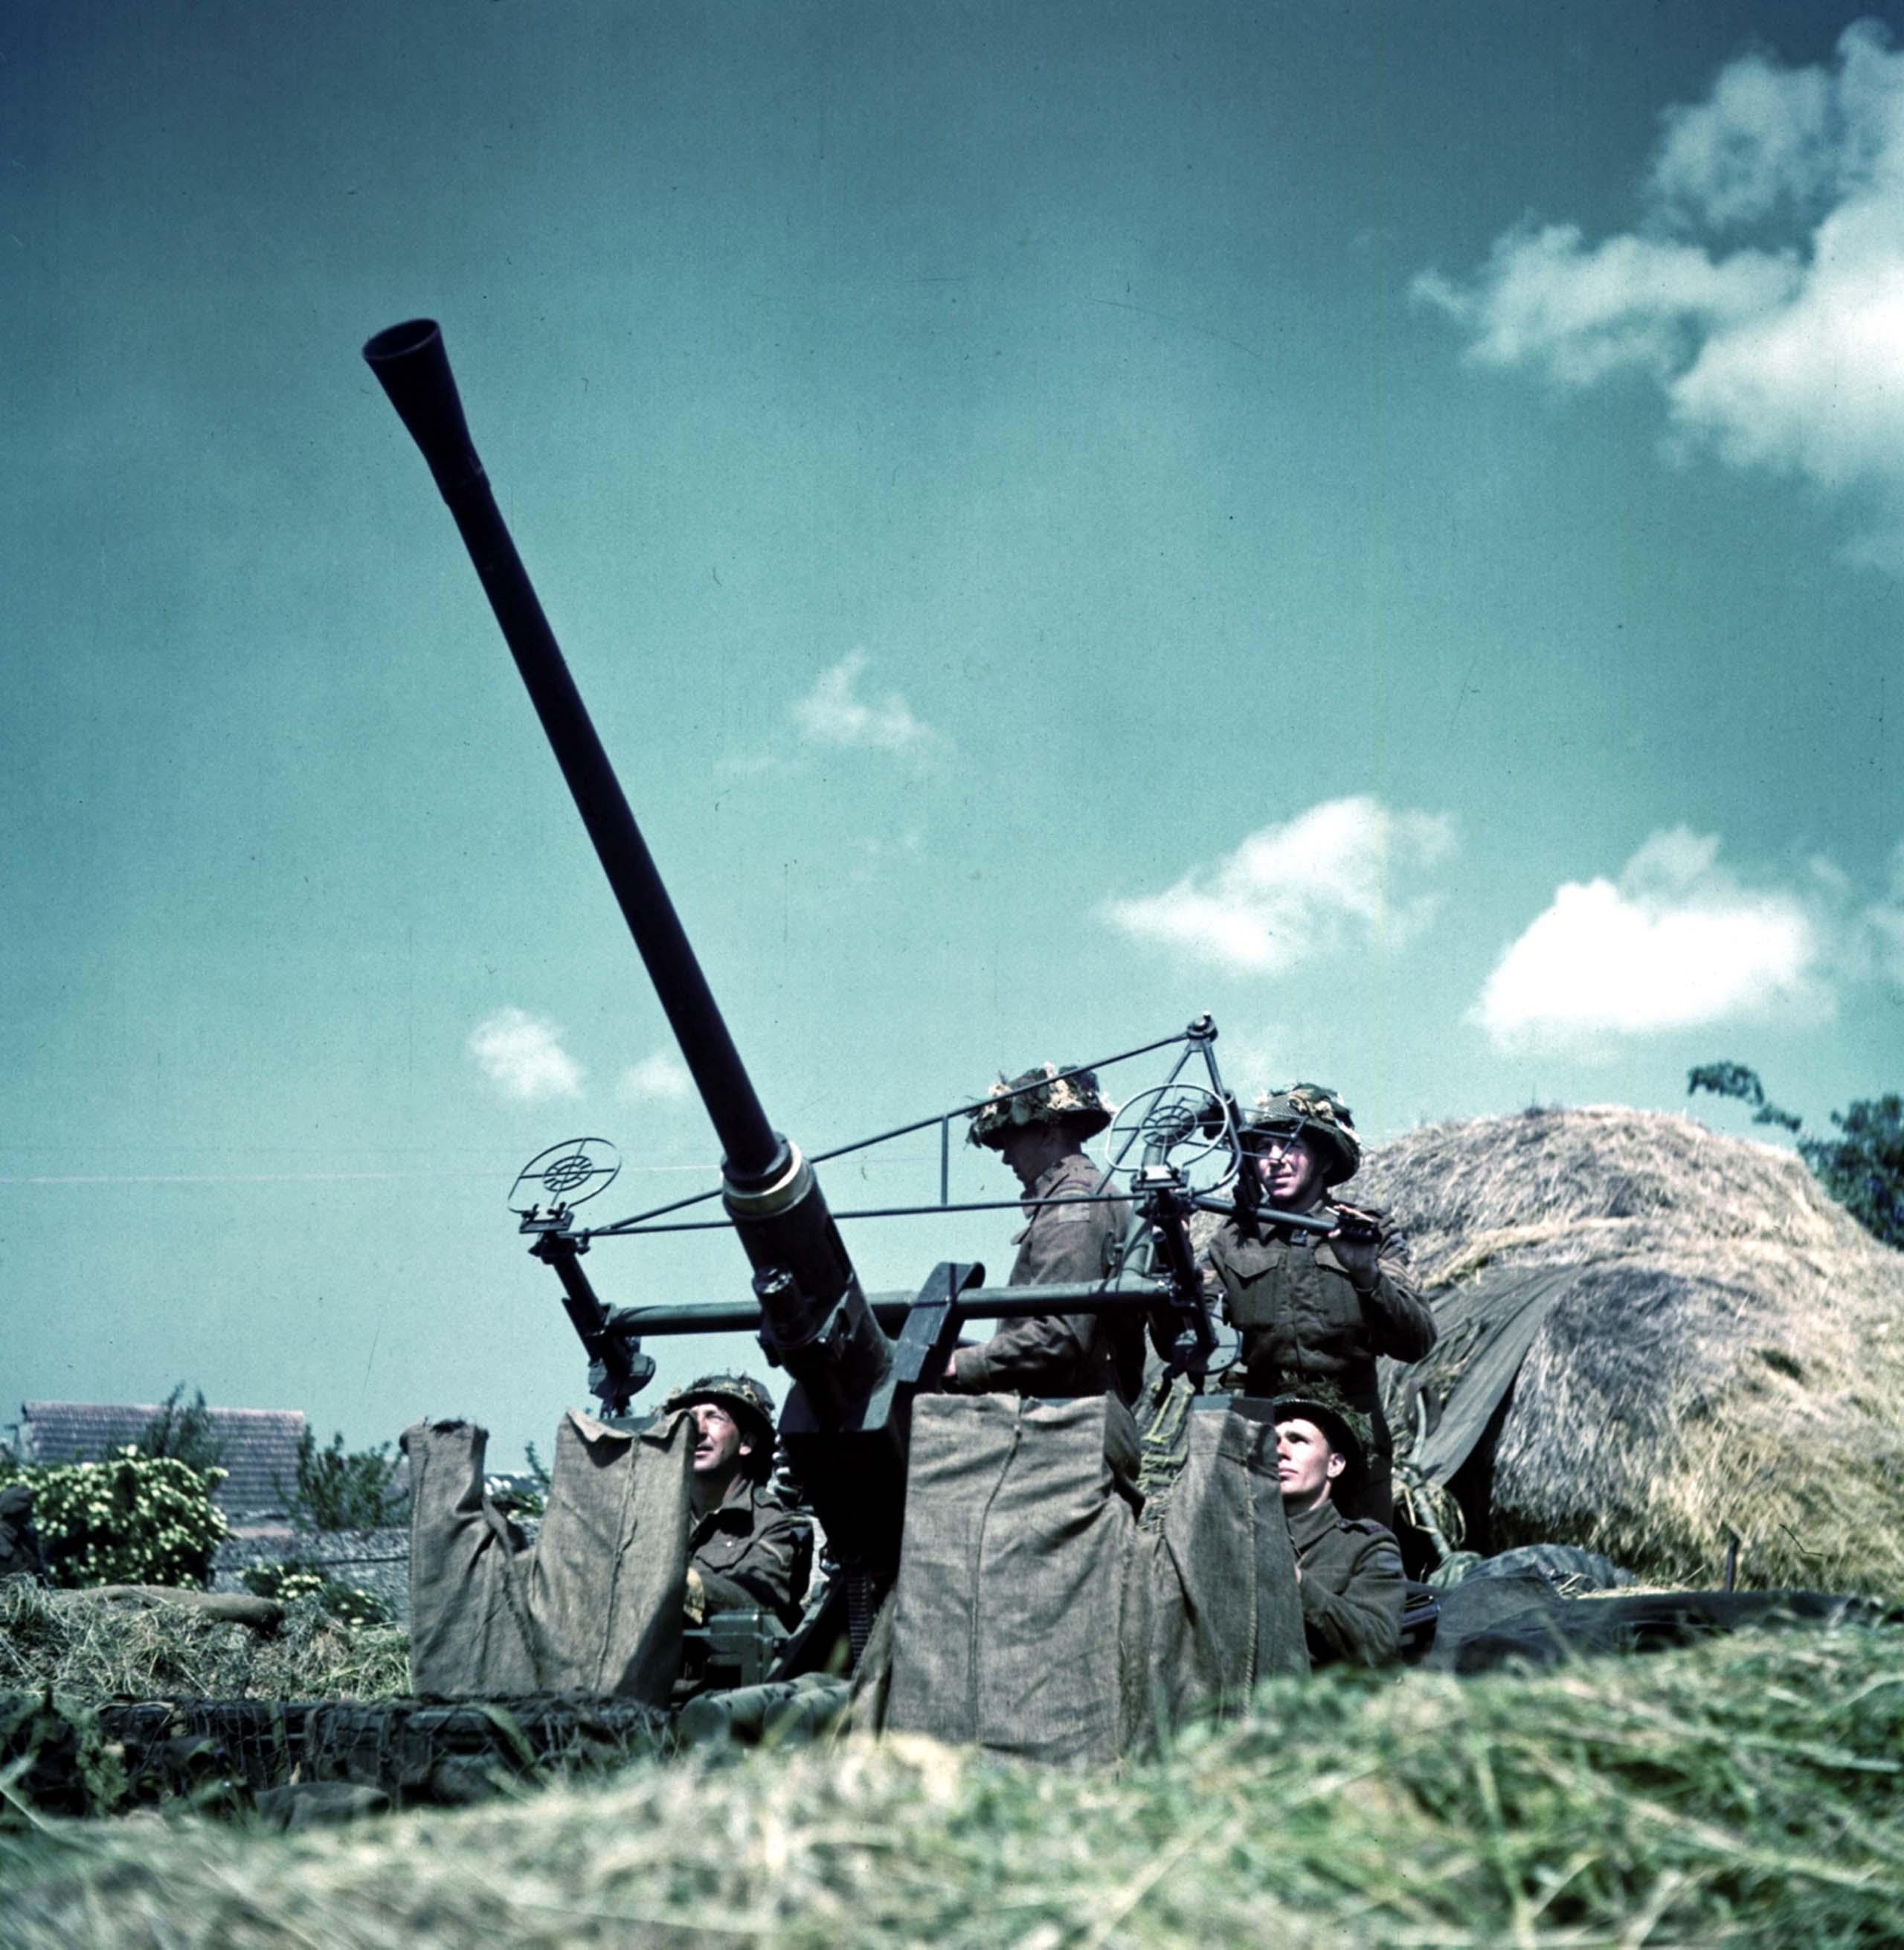 Bofors antiaircraft gun